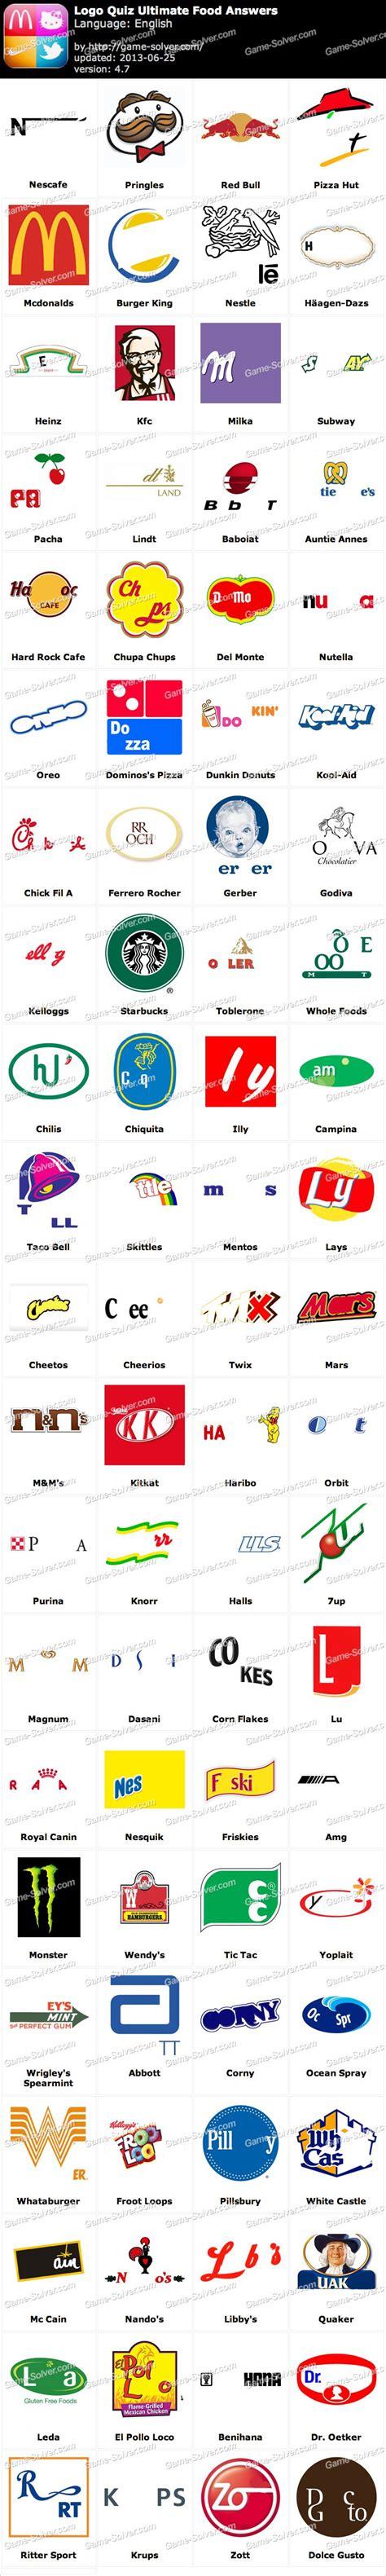 logo quiz ultimate media answers game solver natalia ignasiak google